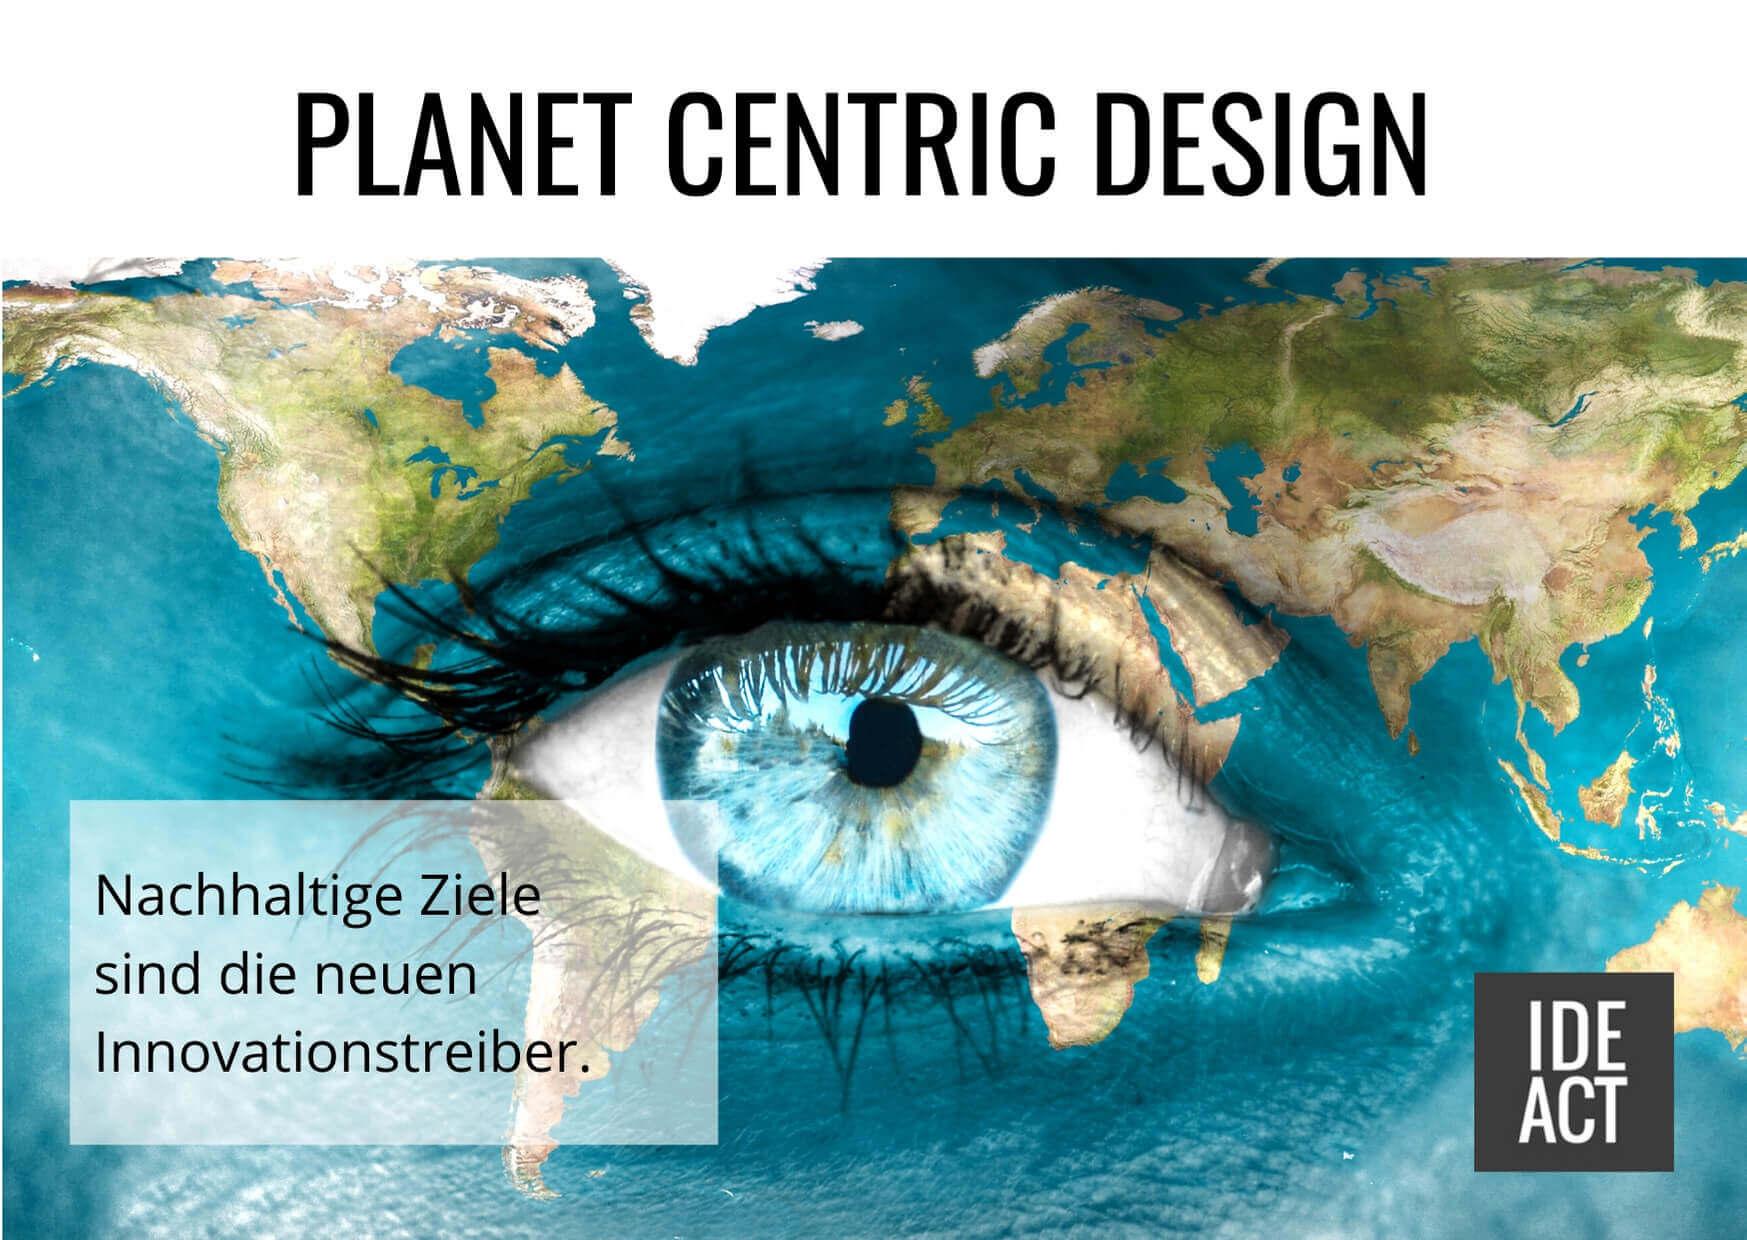 Planet Centric Design